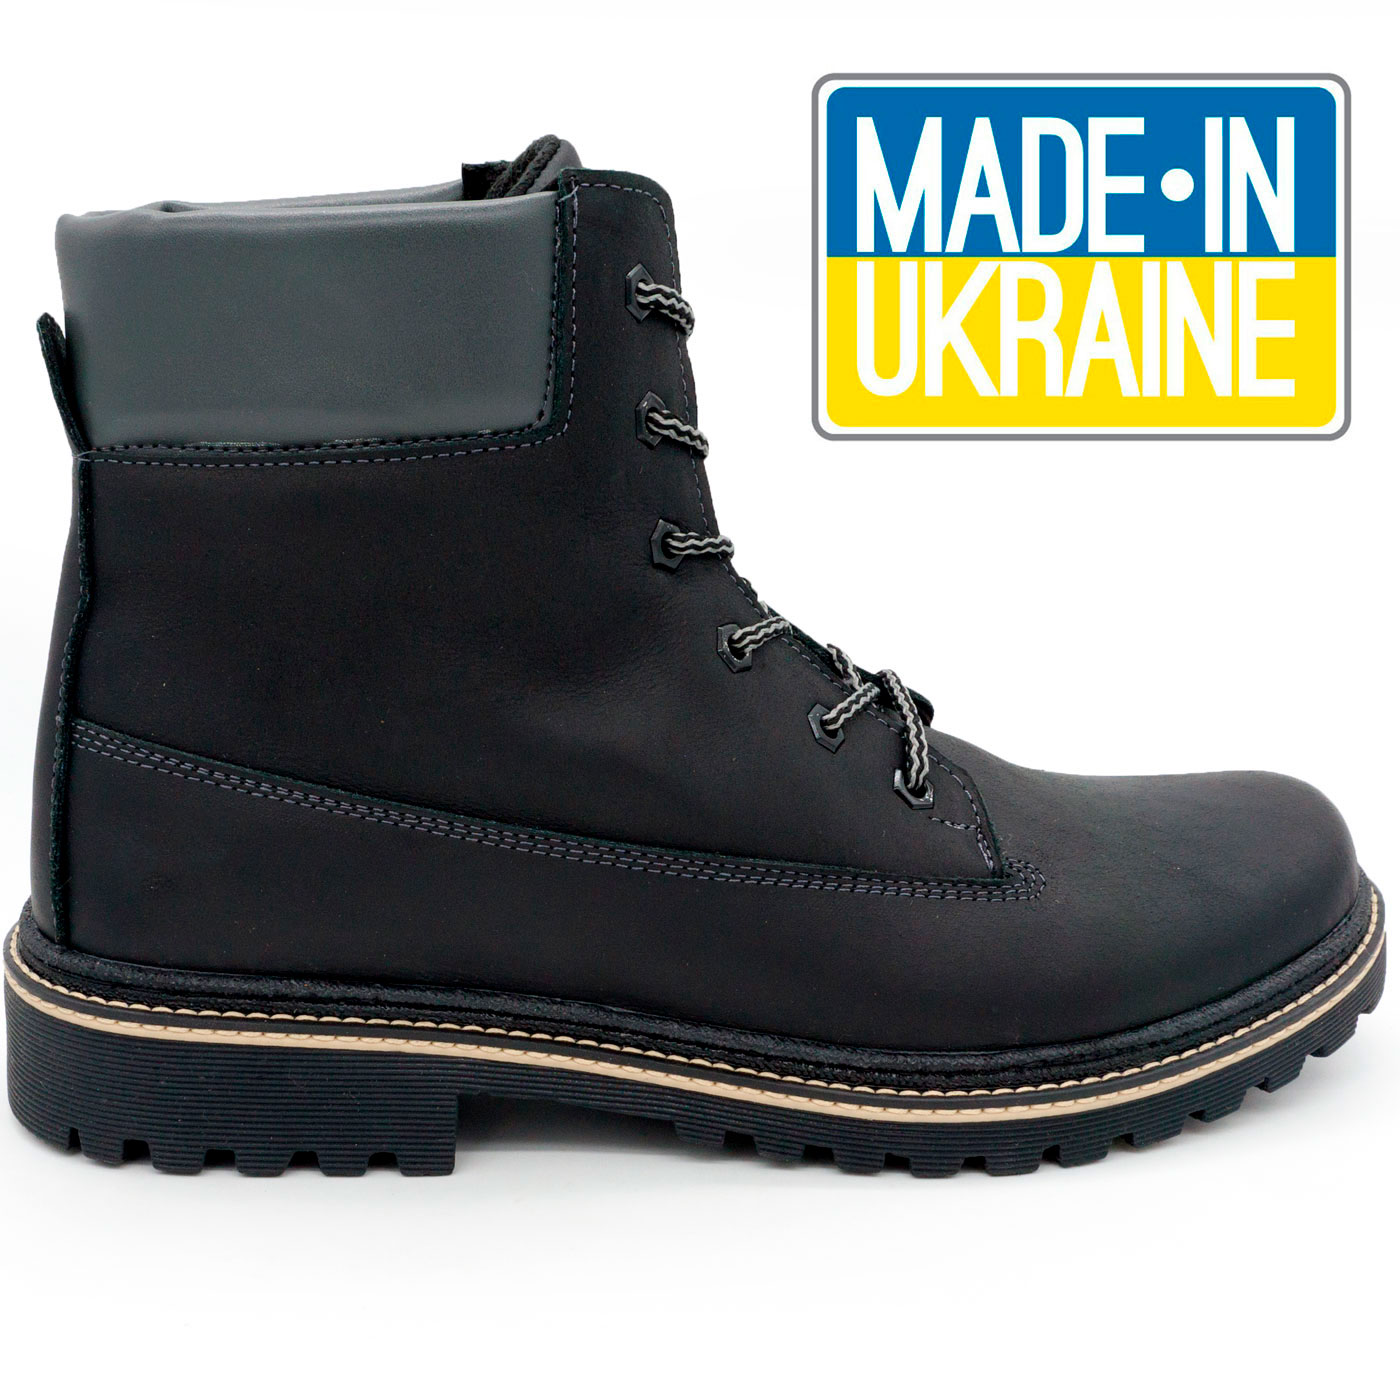 фото main Черные мужские ботинки Реплика Timberland 103 (Тимберленд)  main